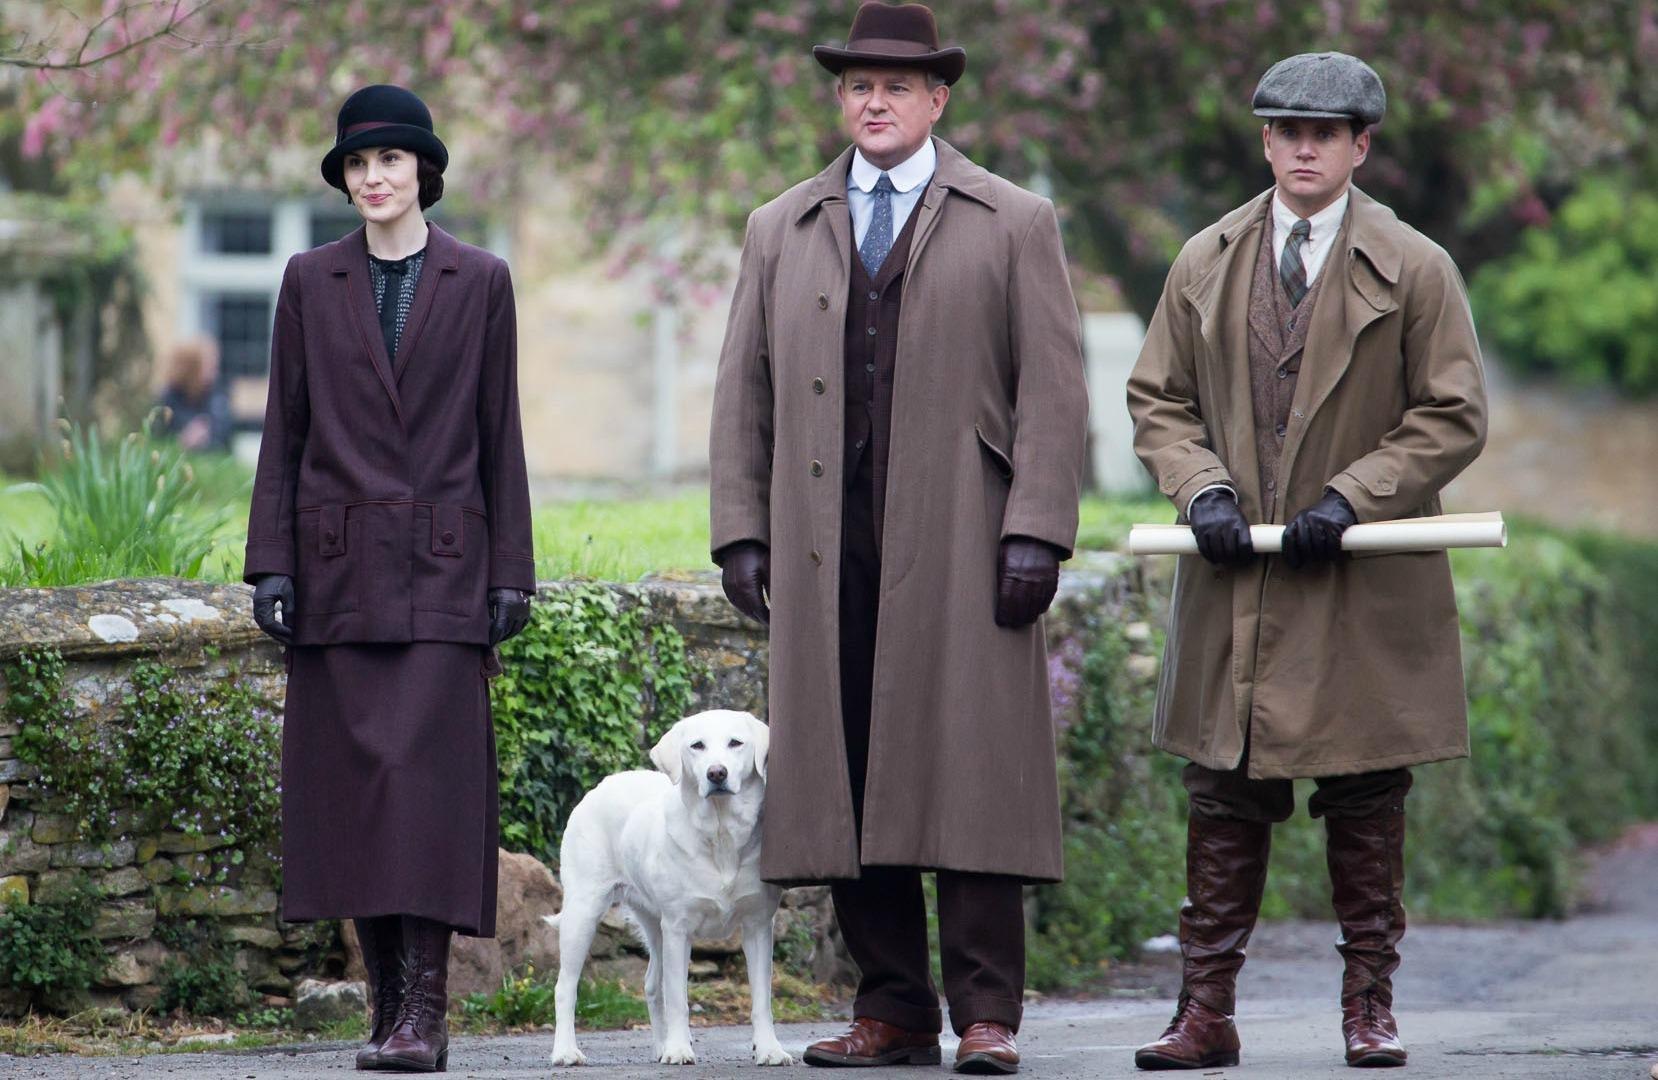 Spot the historical error in Downton Abbey's new promo photo